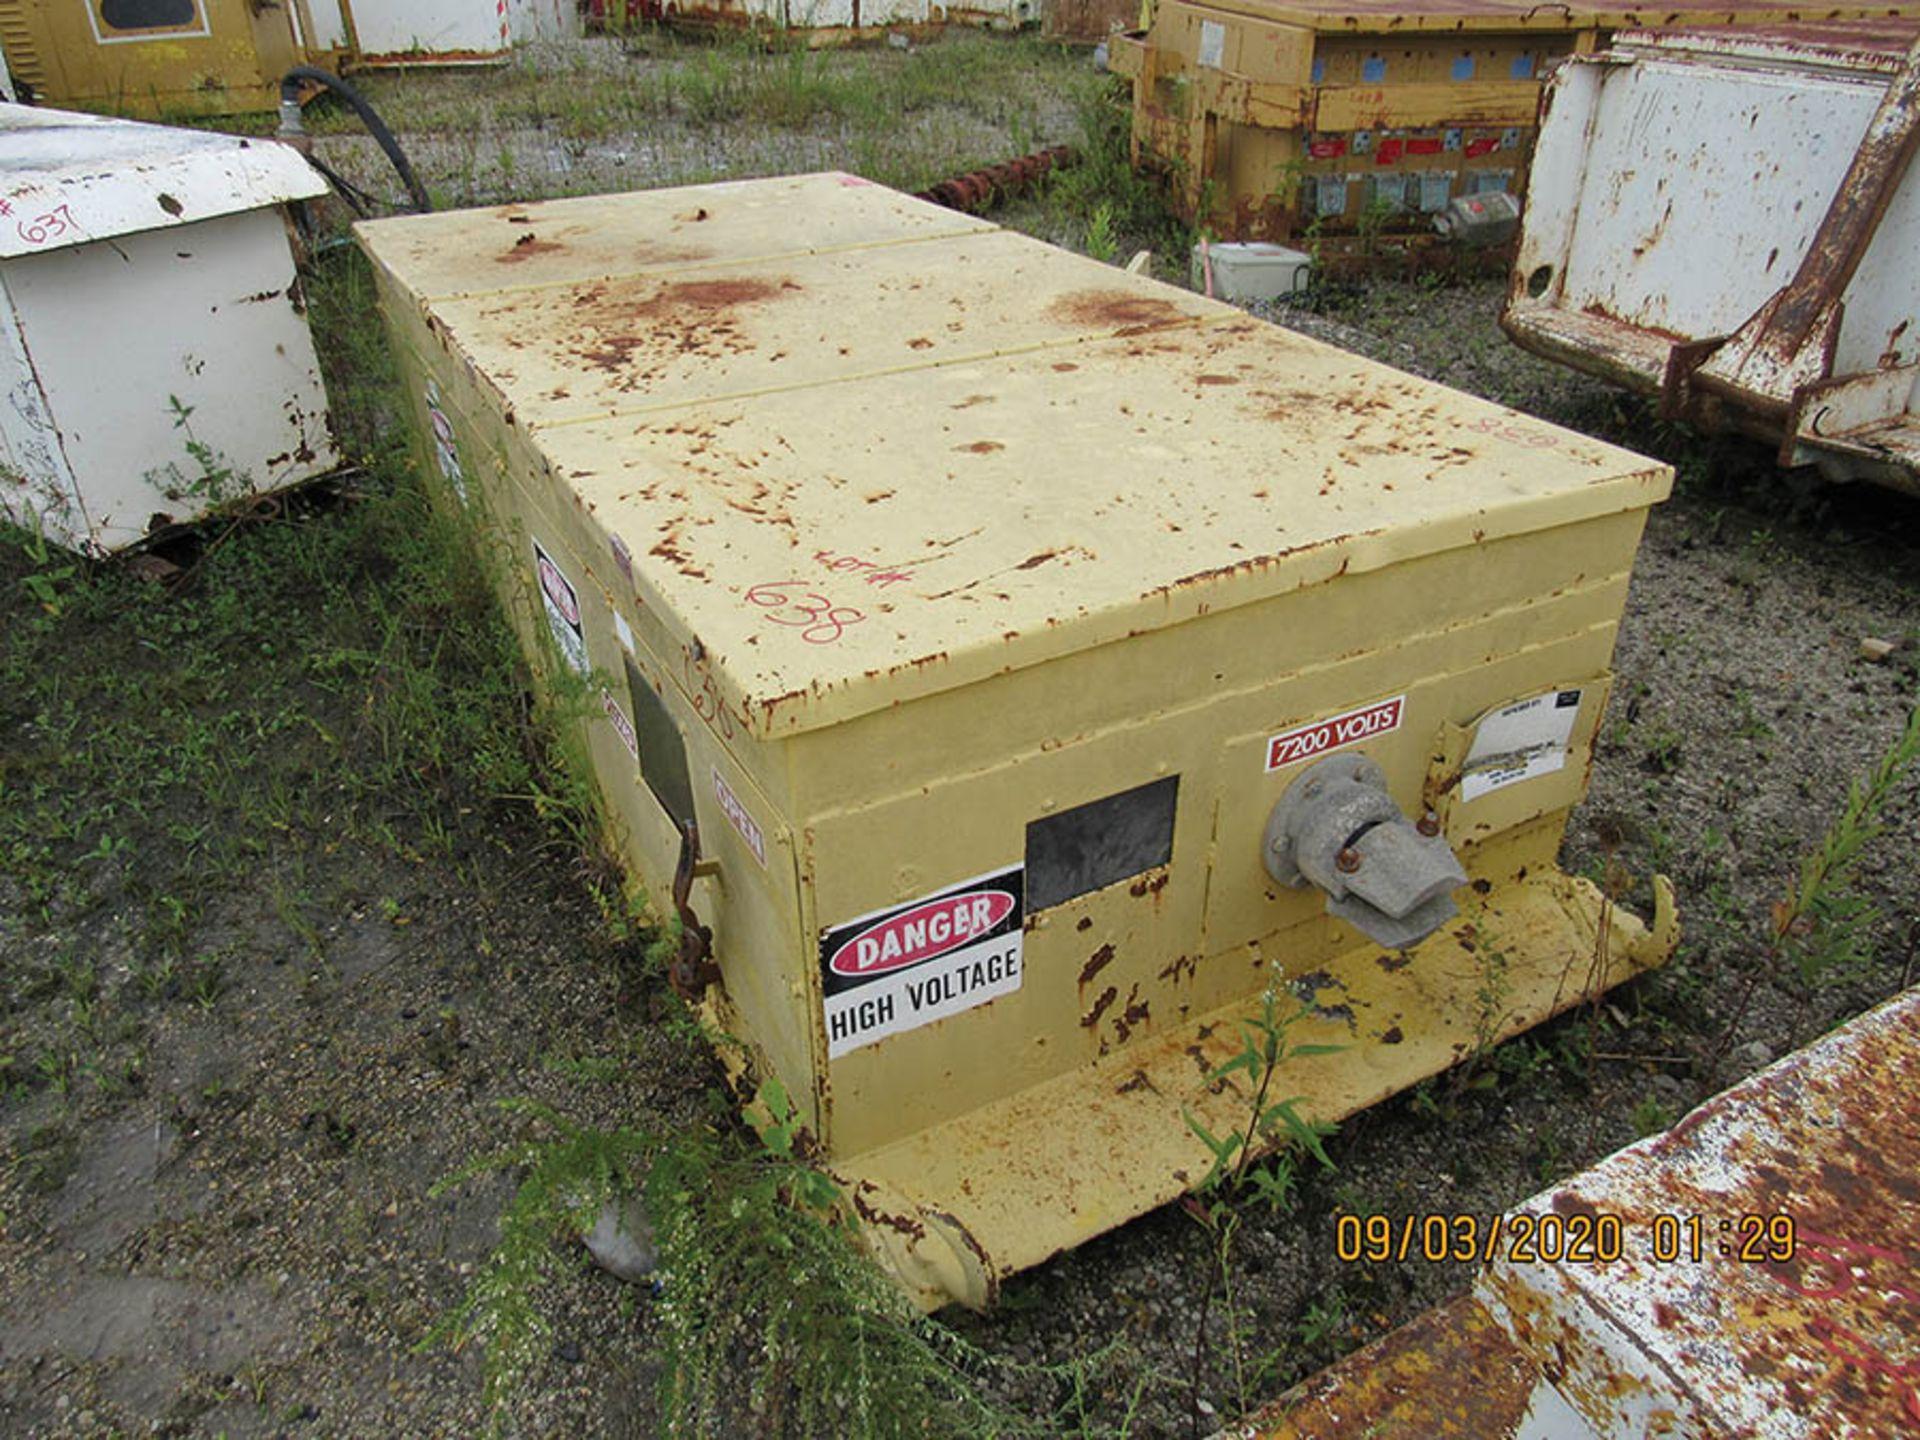 Lot 638 - AMERICAN ELECTRIC EQUIPMENT POWER CENTER, 7,200 V., S/N 10031-1196